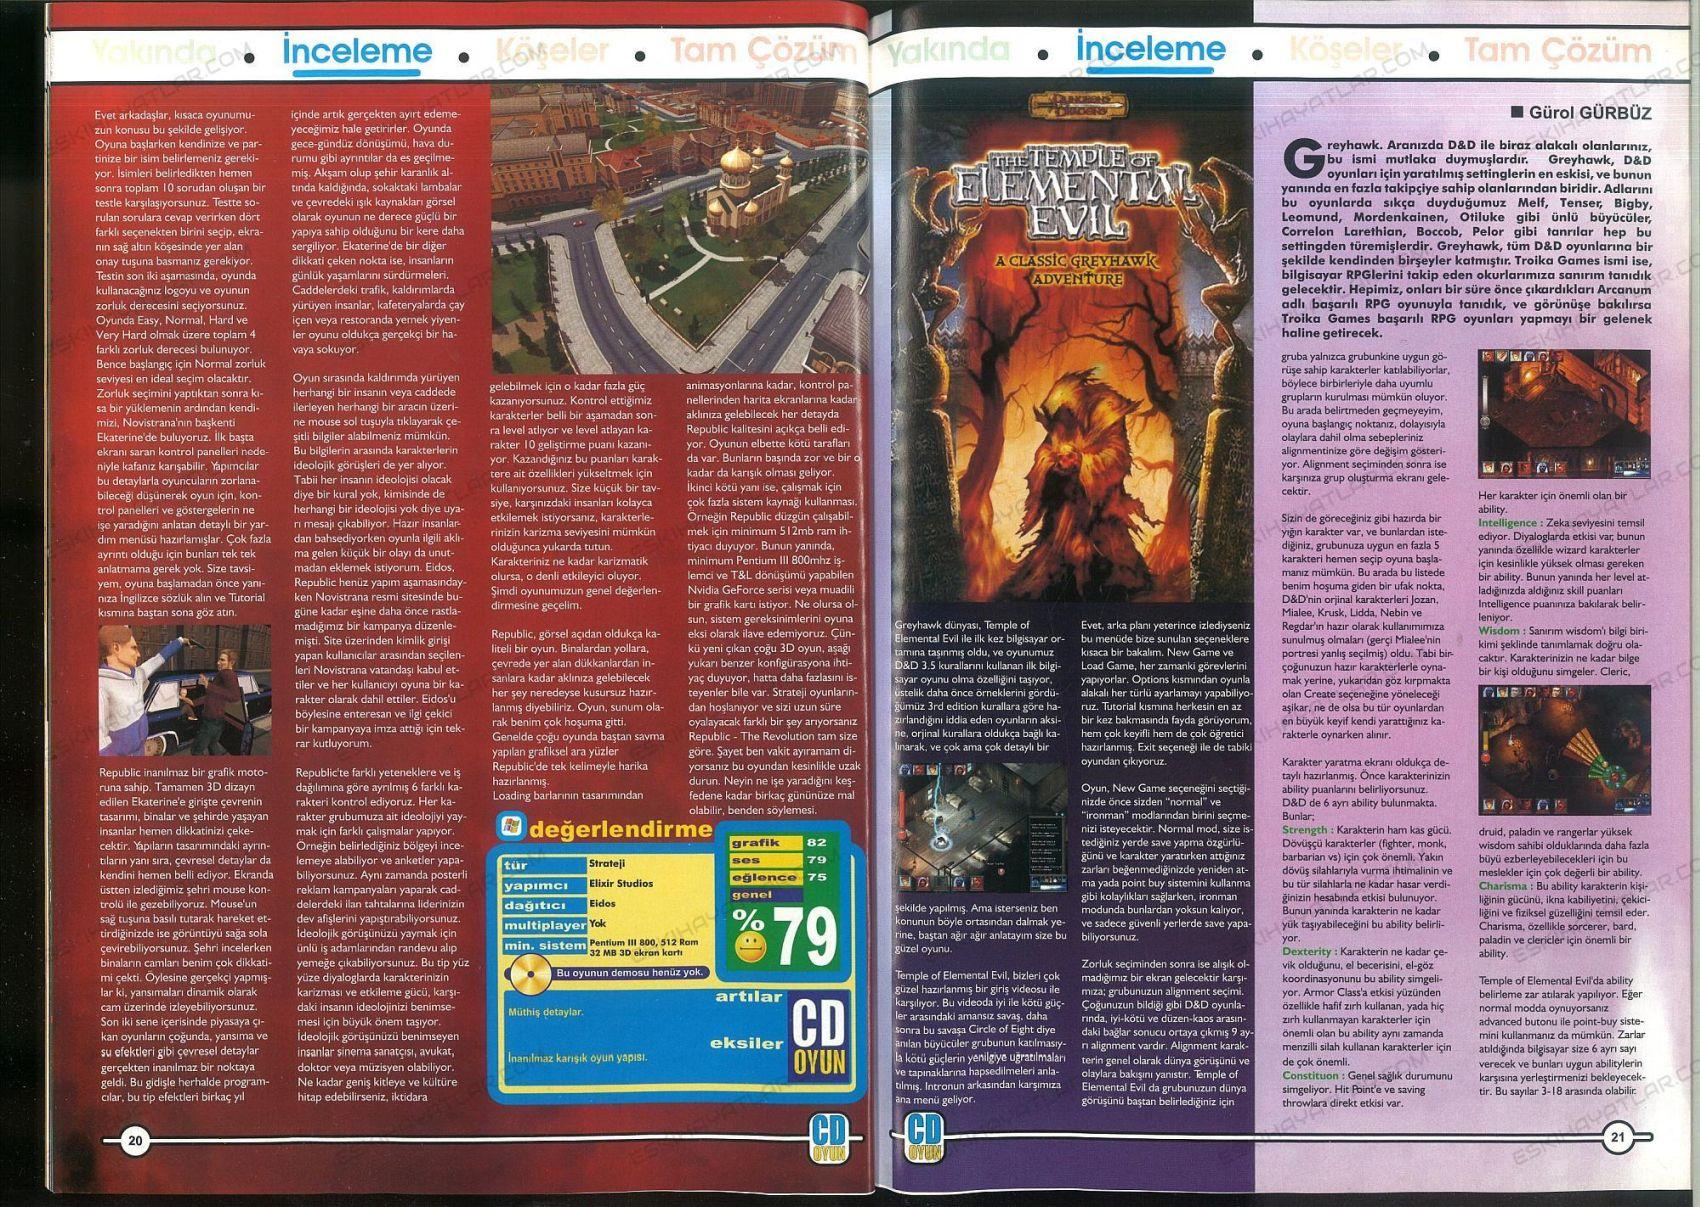 0278-republic-of-revolotion-oyun-incelemesi-2004-cd-oyun-dergisi (1)